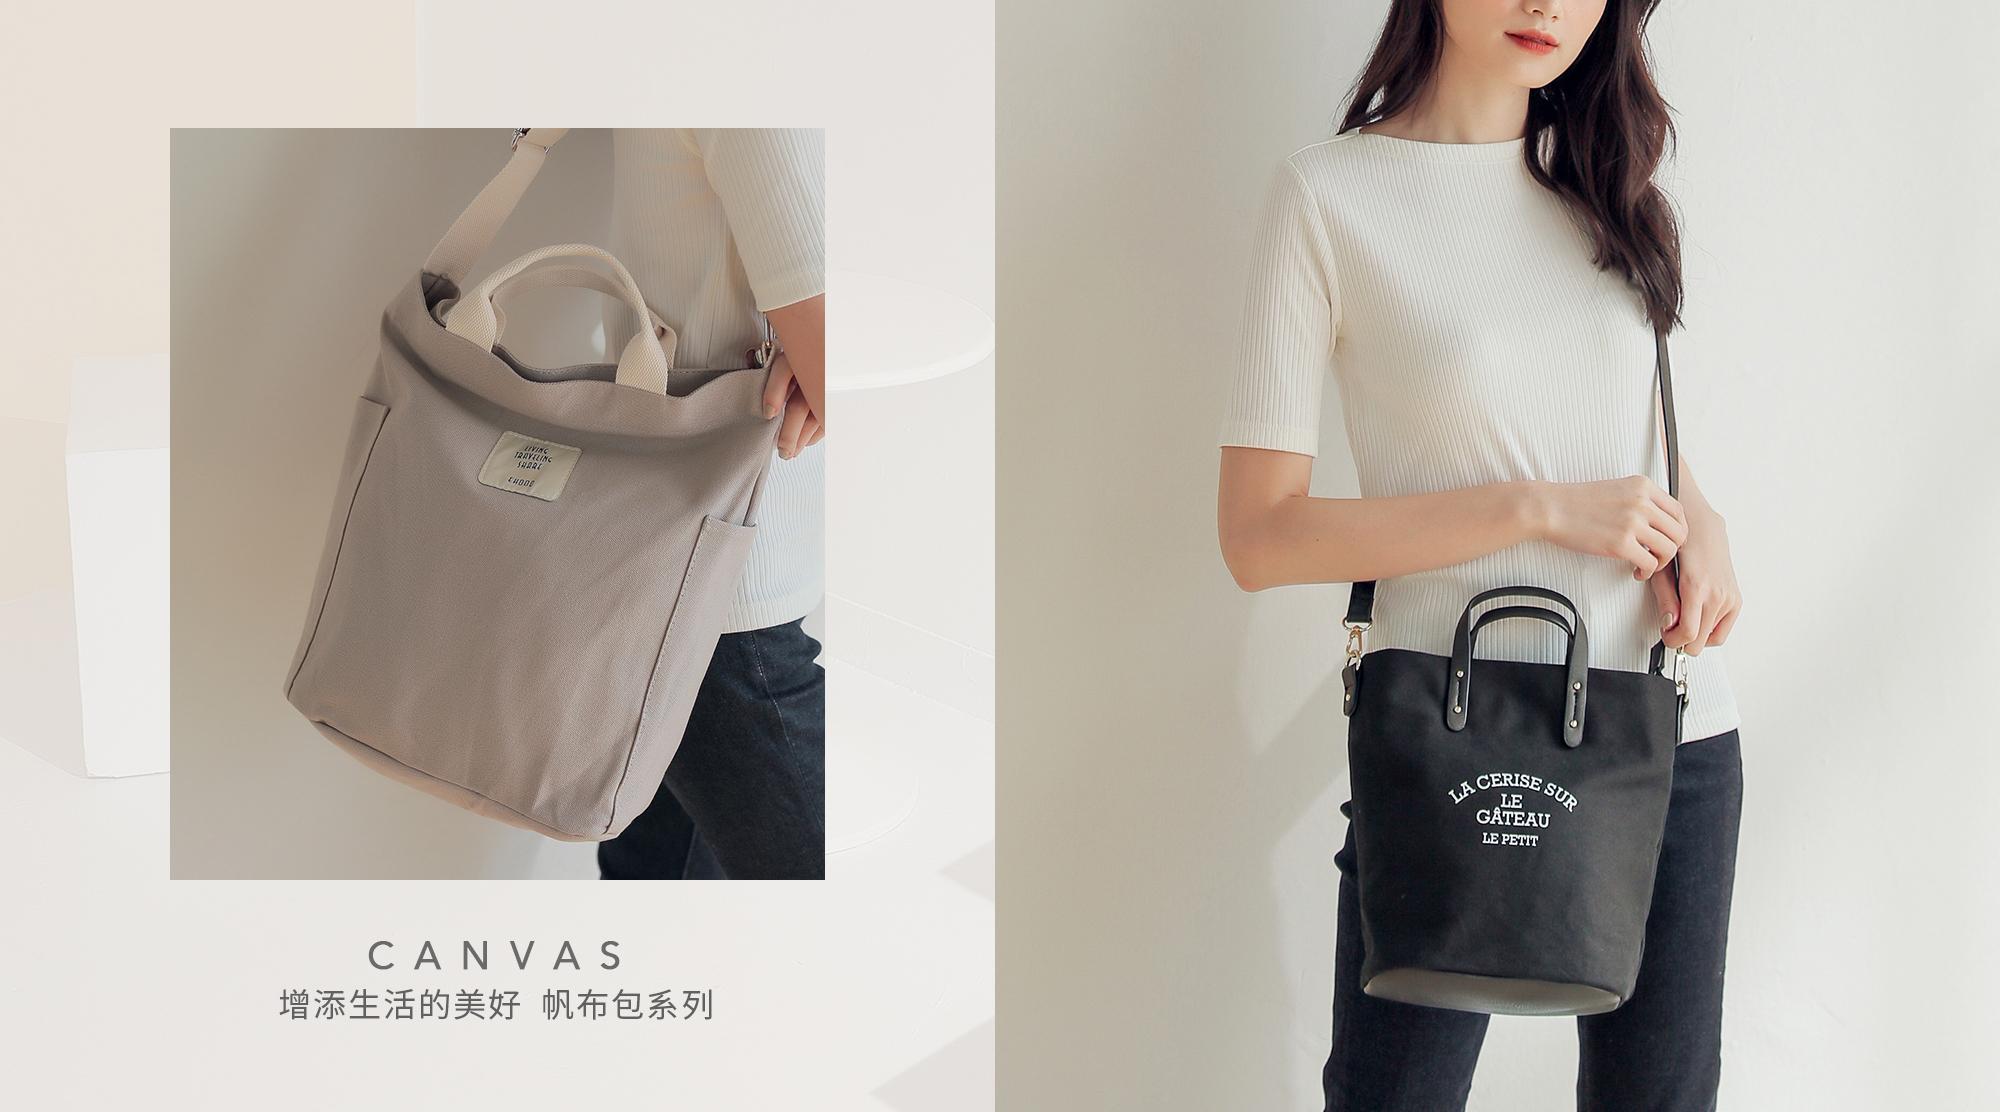 https://www.kiiwio.com/products?query=%E5%B8%86%E5%B8%83